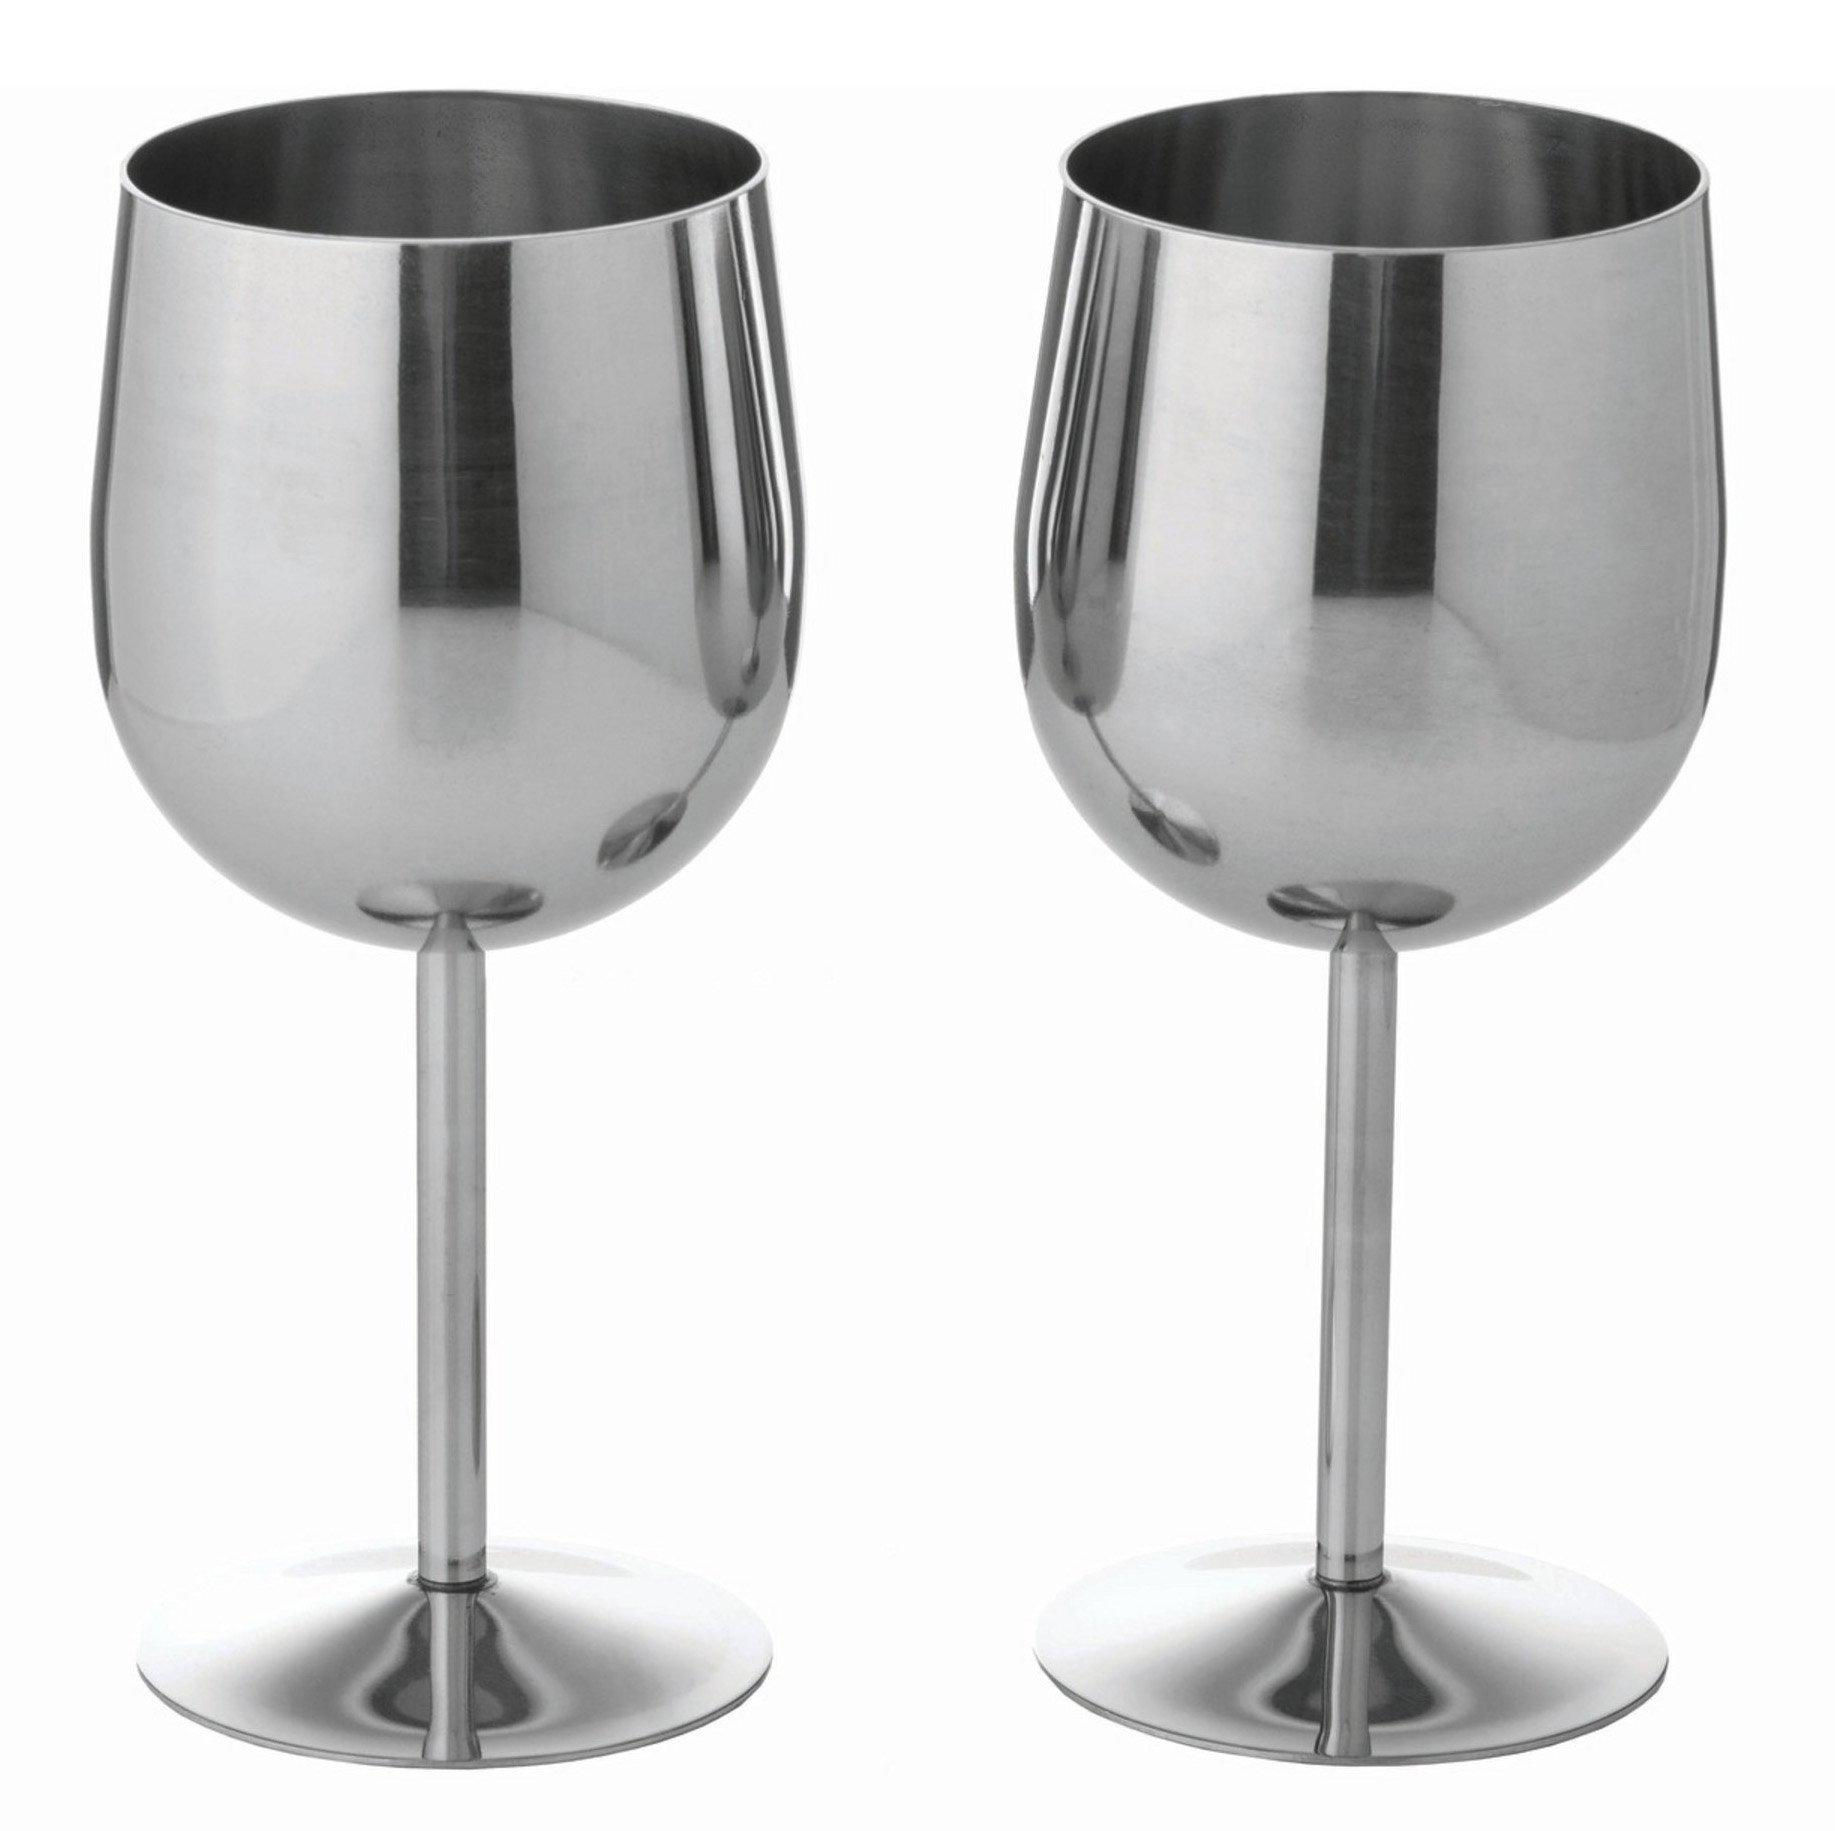 BNFUSA KTWGLS 2 Piece Stainless Steel Wine Goblet Set, NA